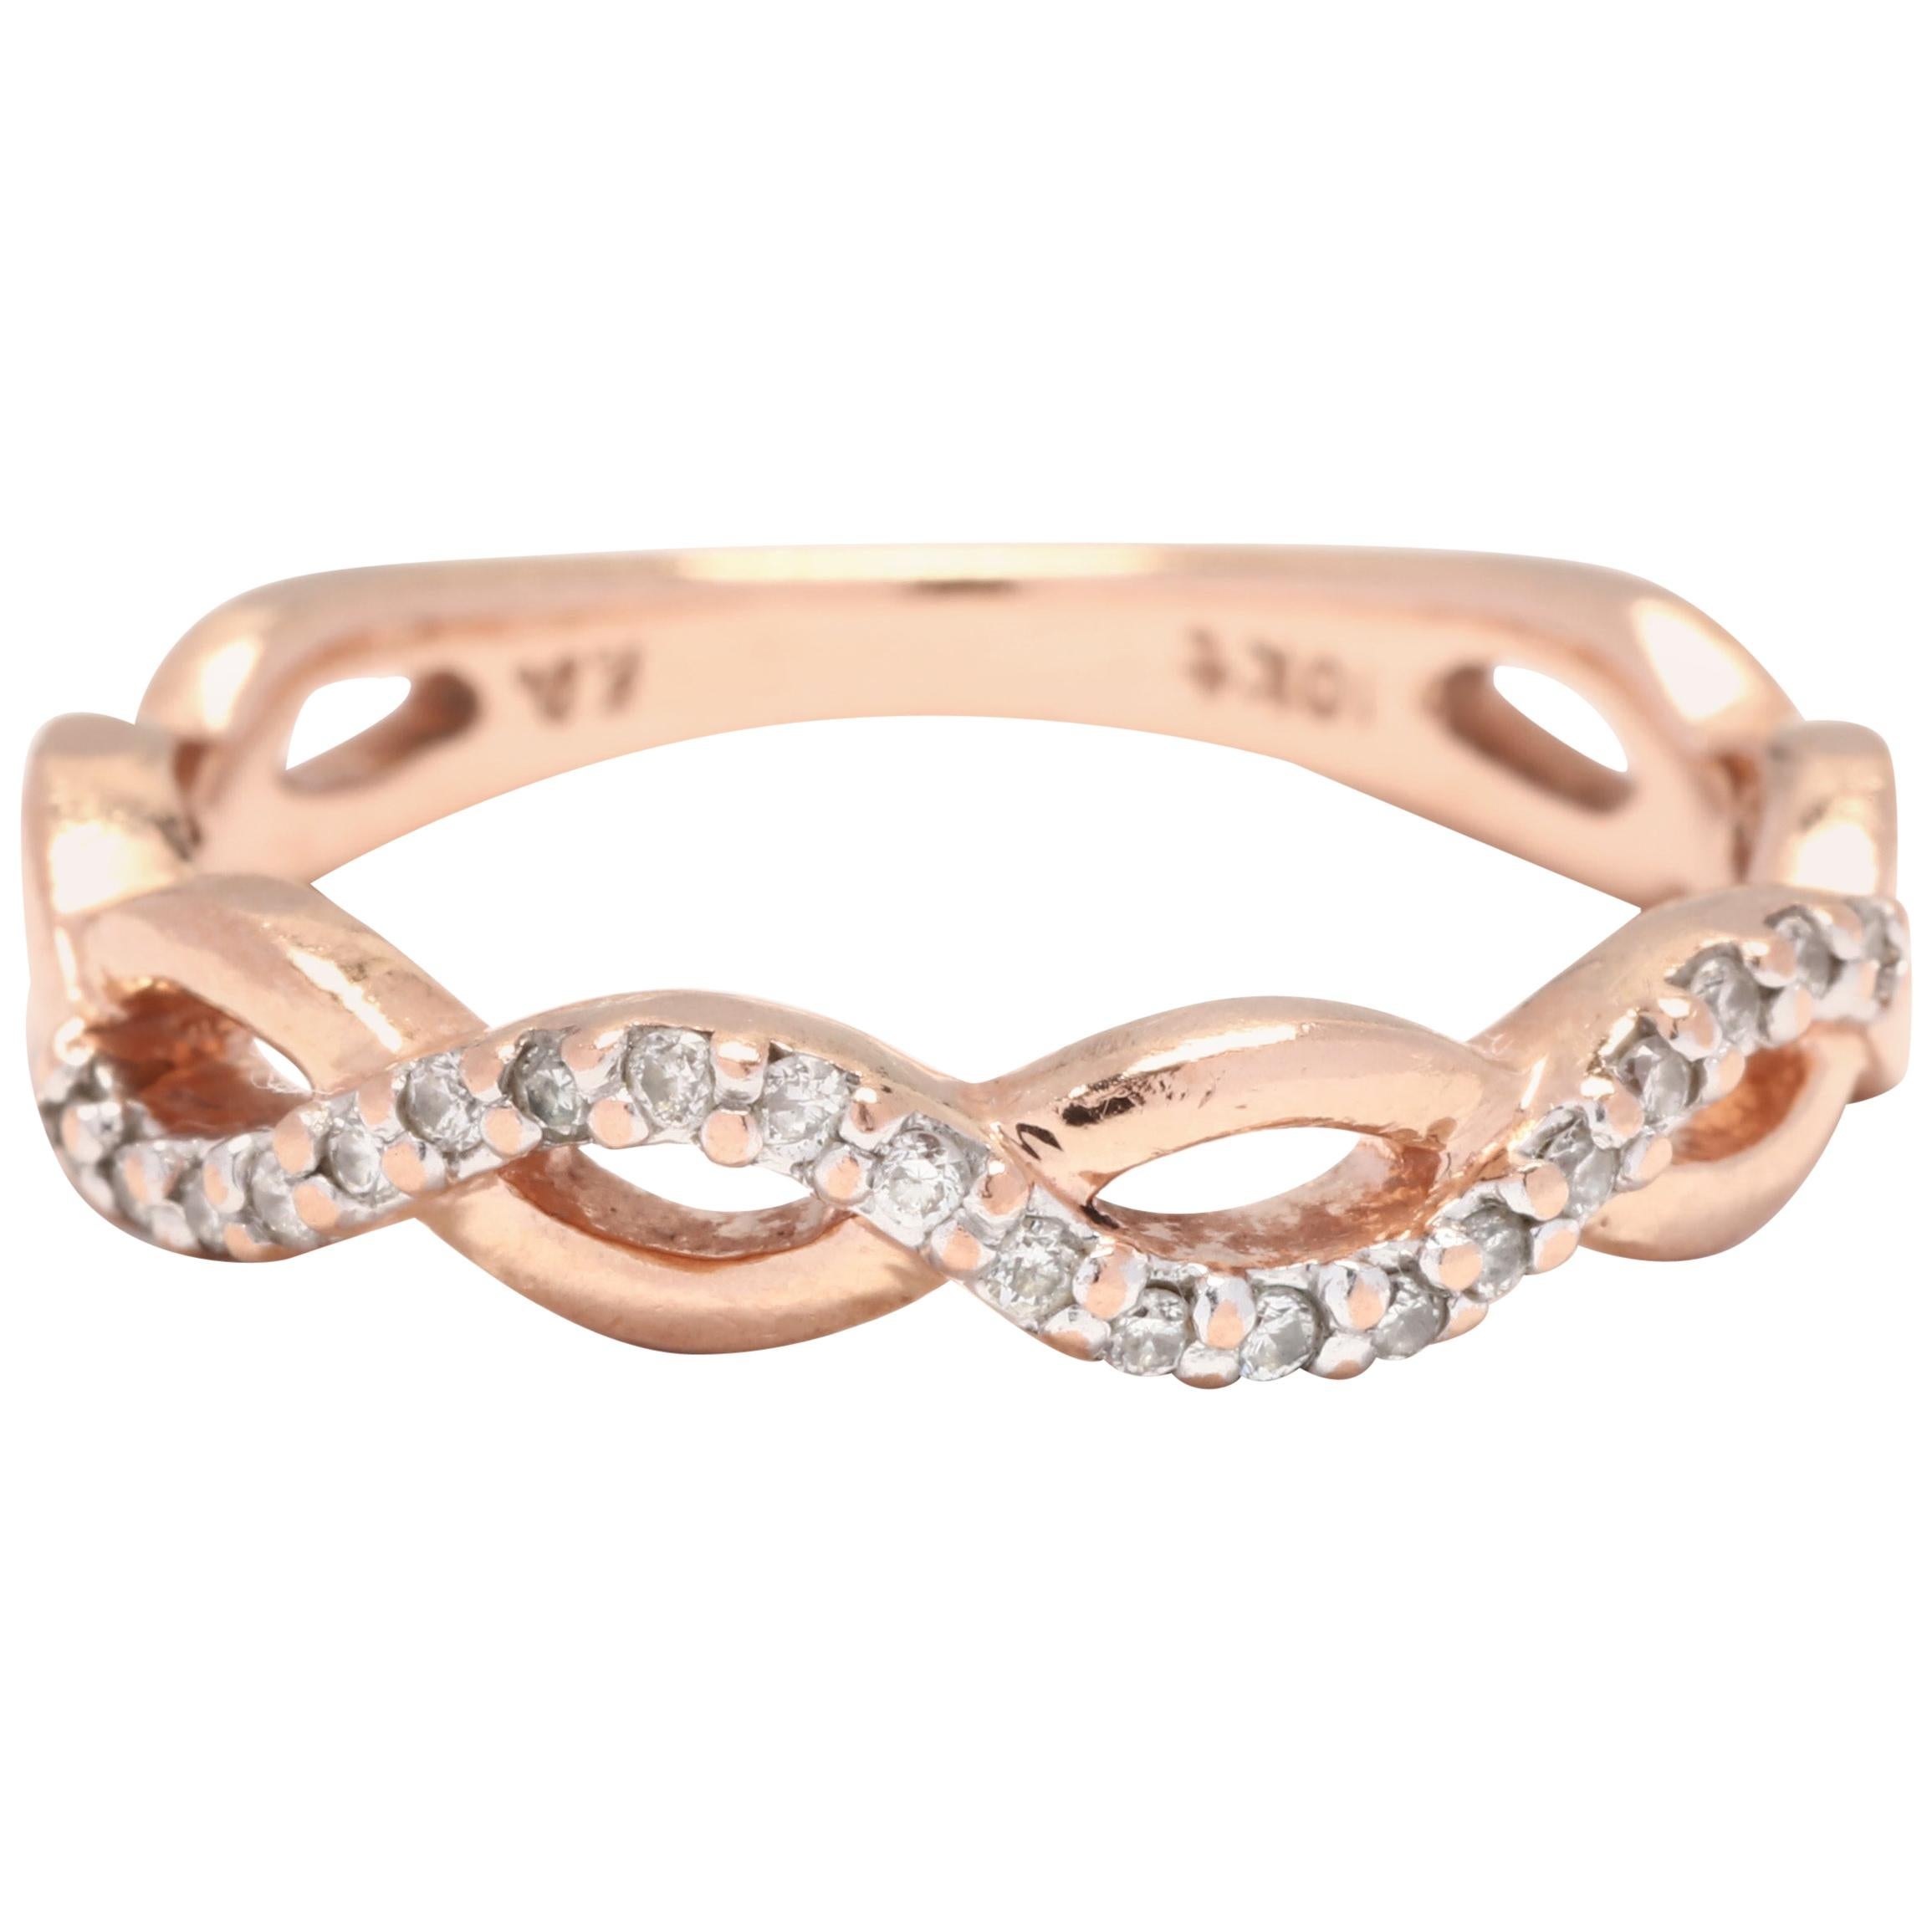 10 Karat Rose Gold and Diamond Criss Cross Infinity Band Ring